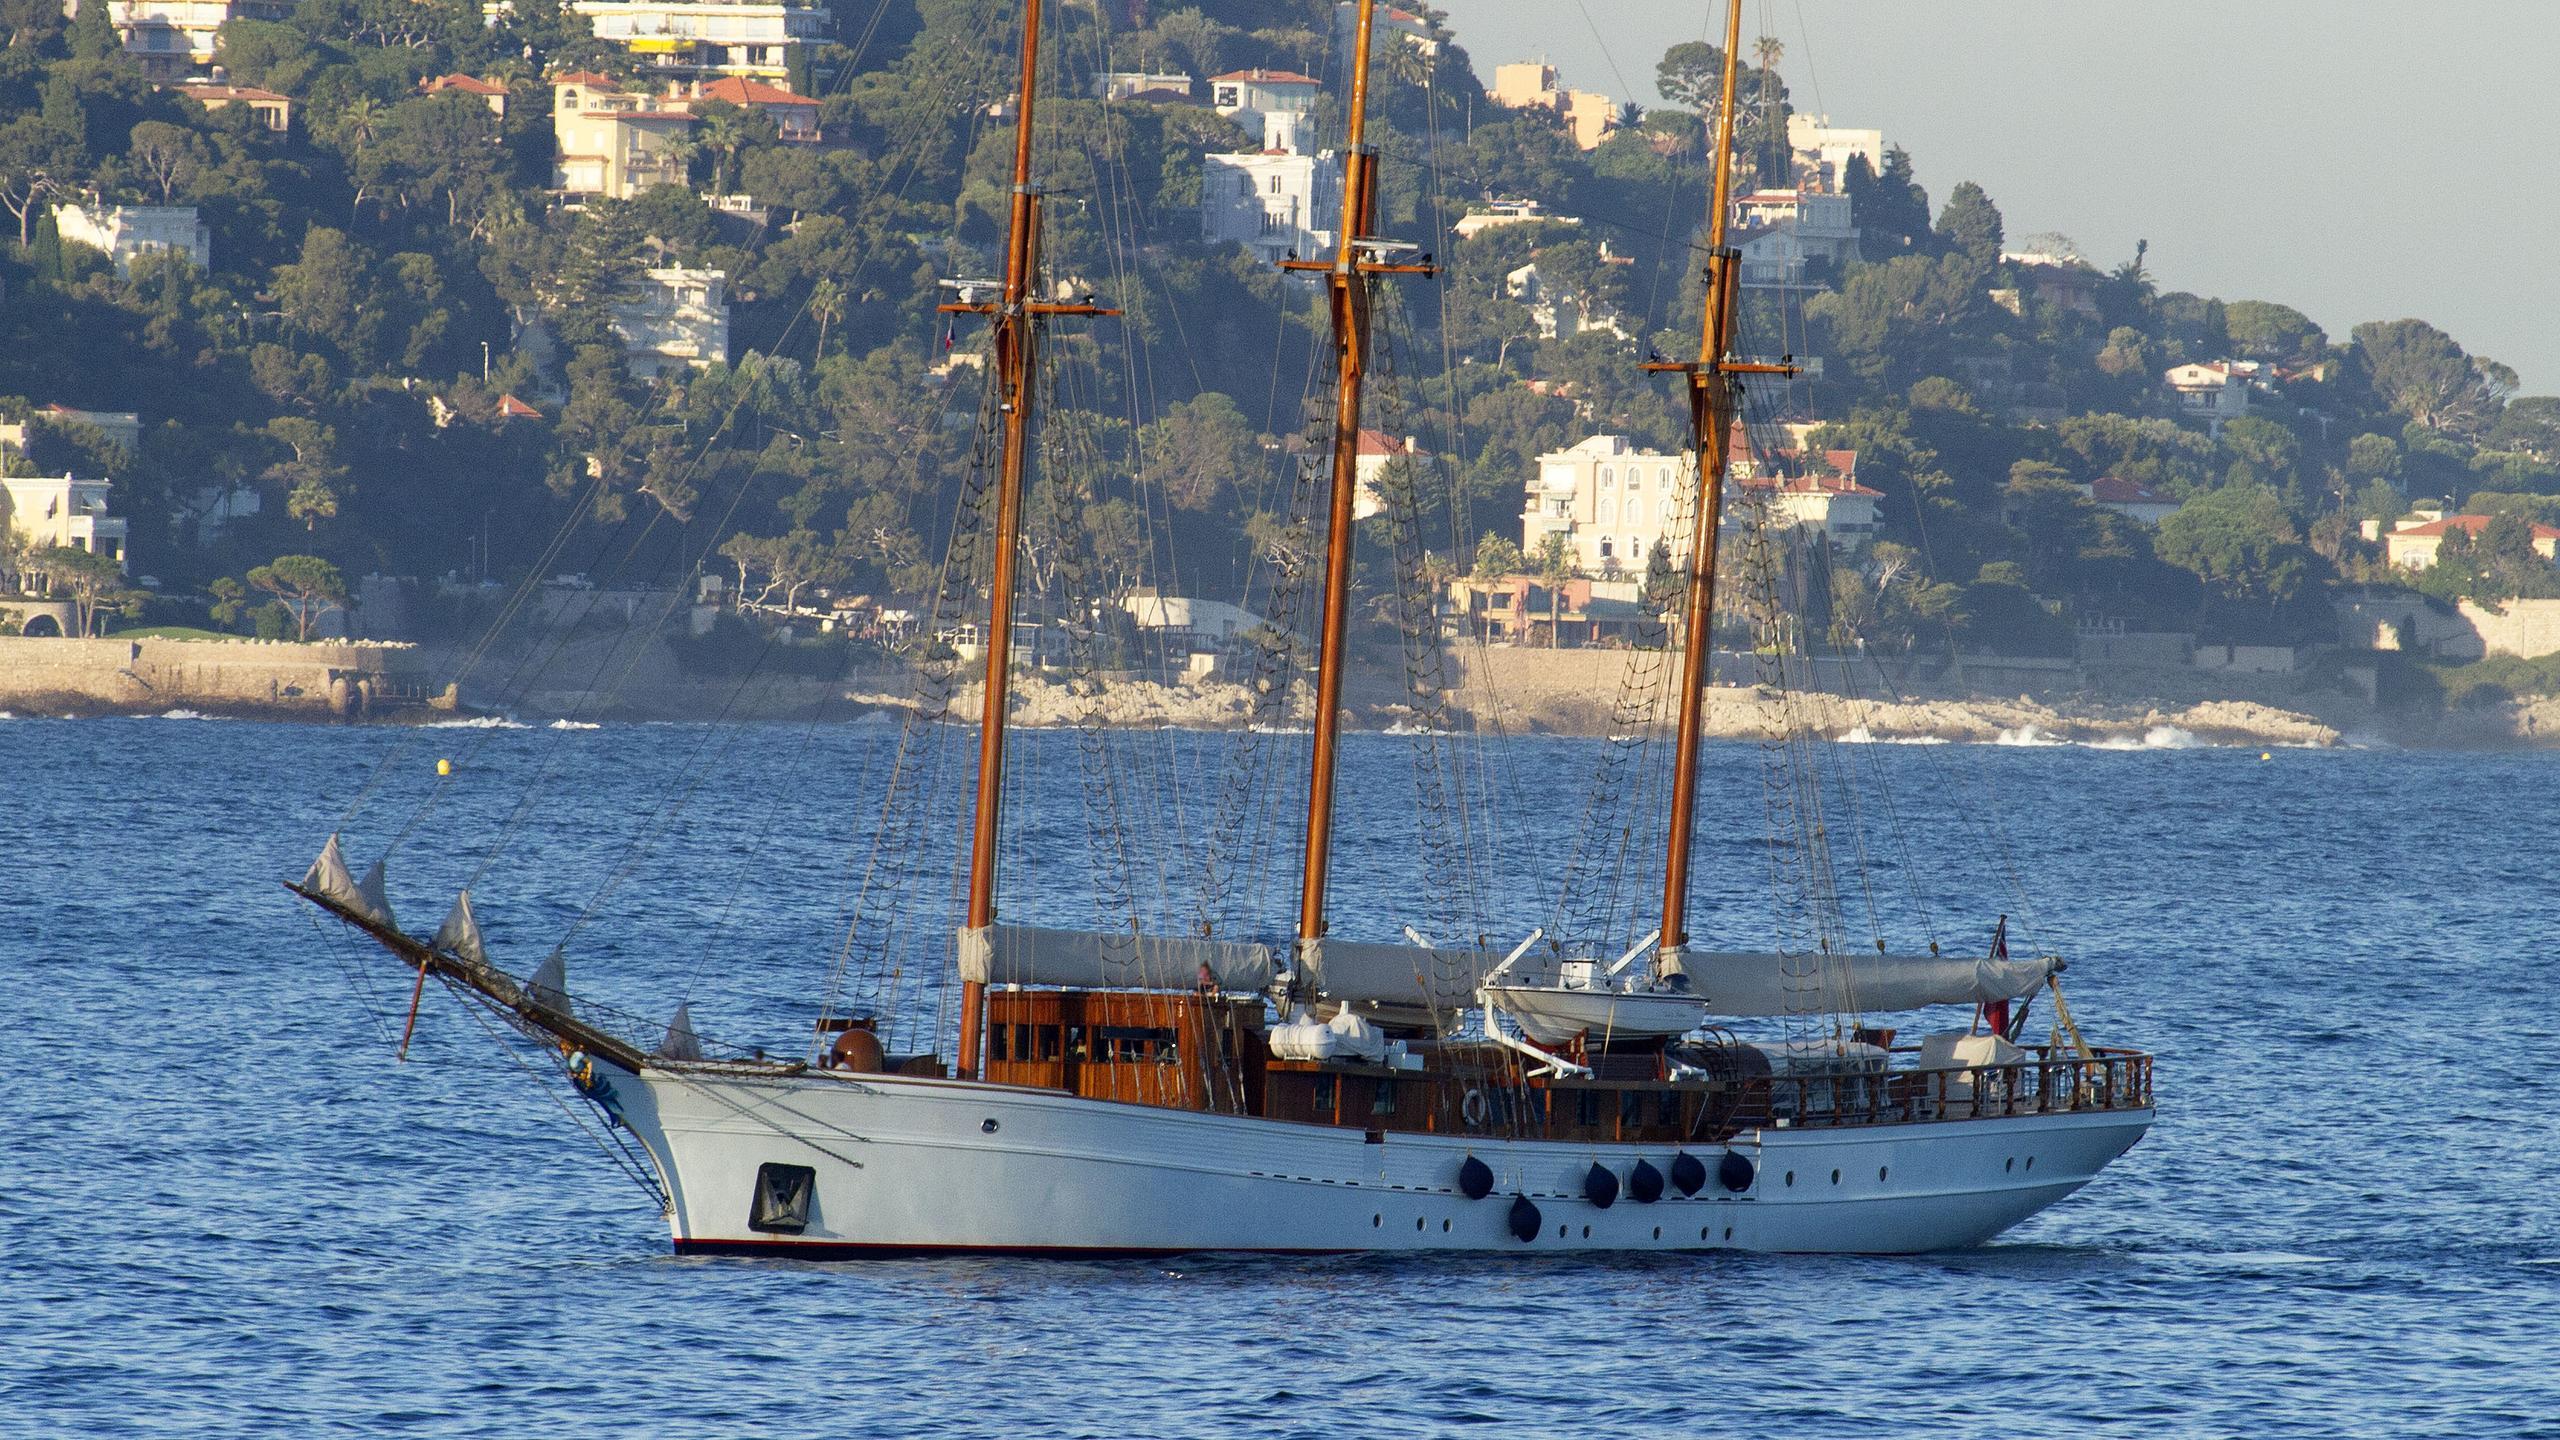 baboon-sailing-yacht-feab-marstrandsverken-1990-62m-running-half-profile